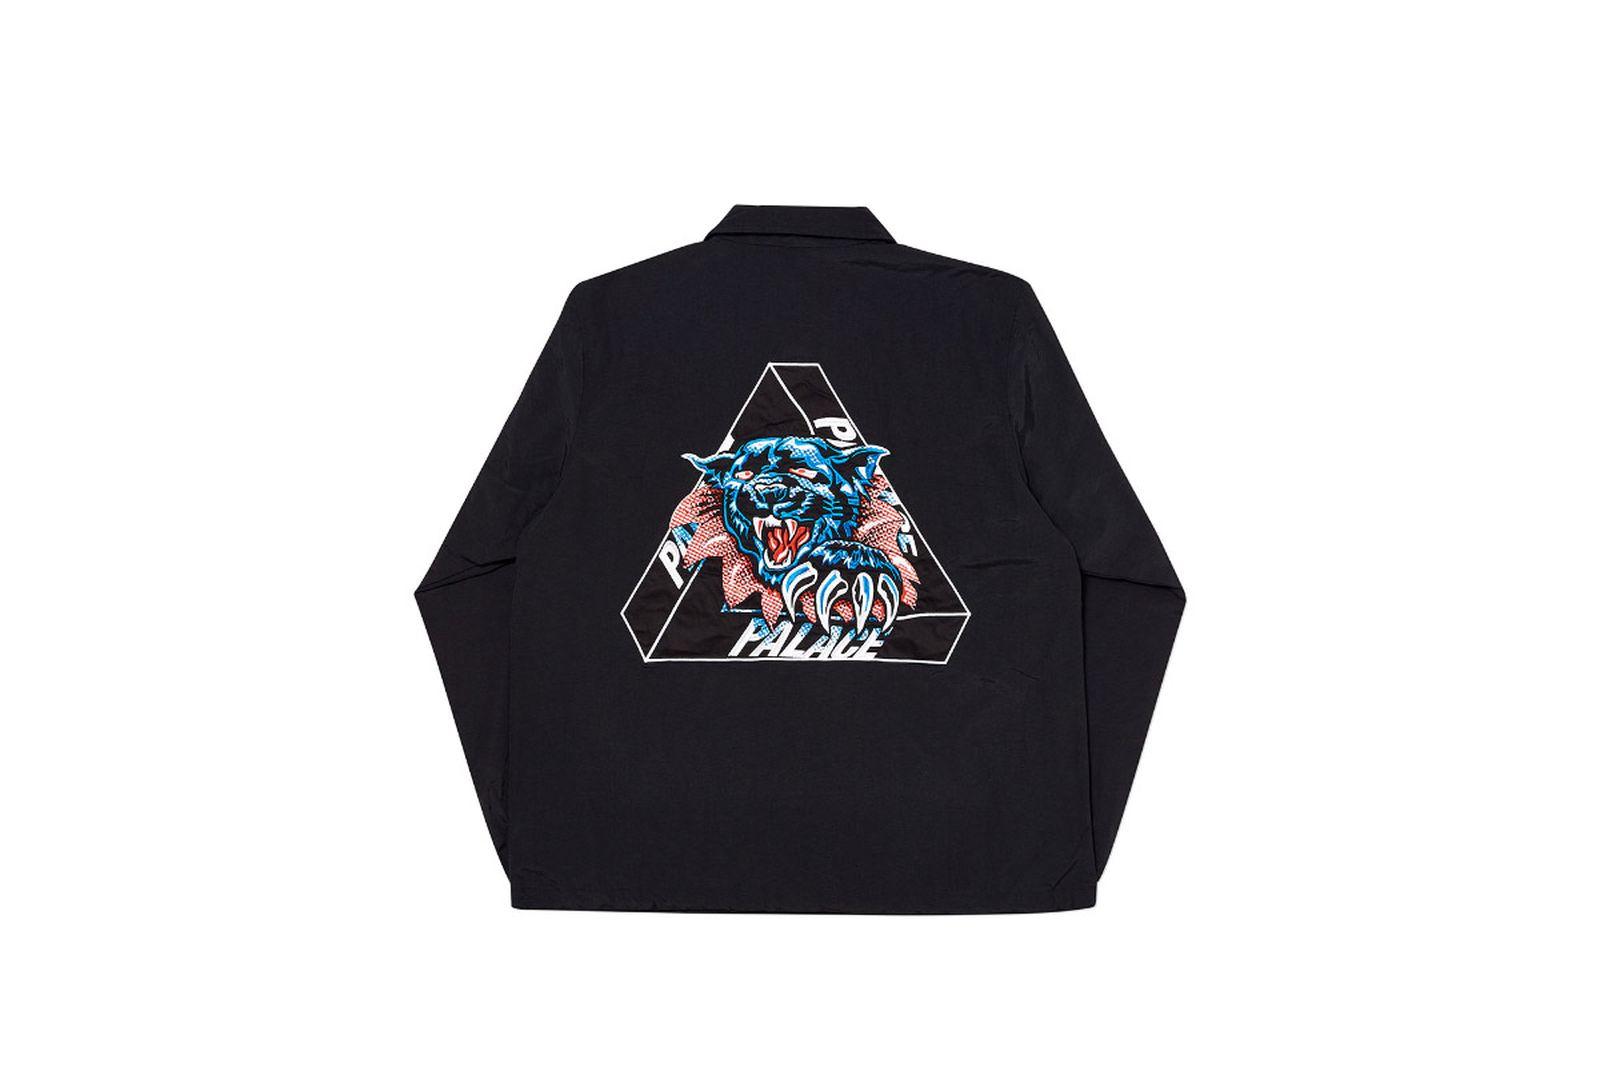 Palace 2019 Autumn Jacket Ripped Coach black back fw19